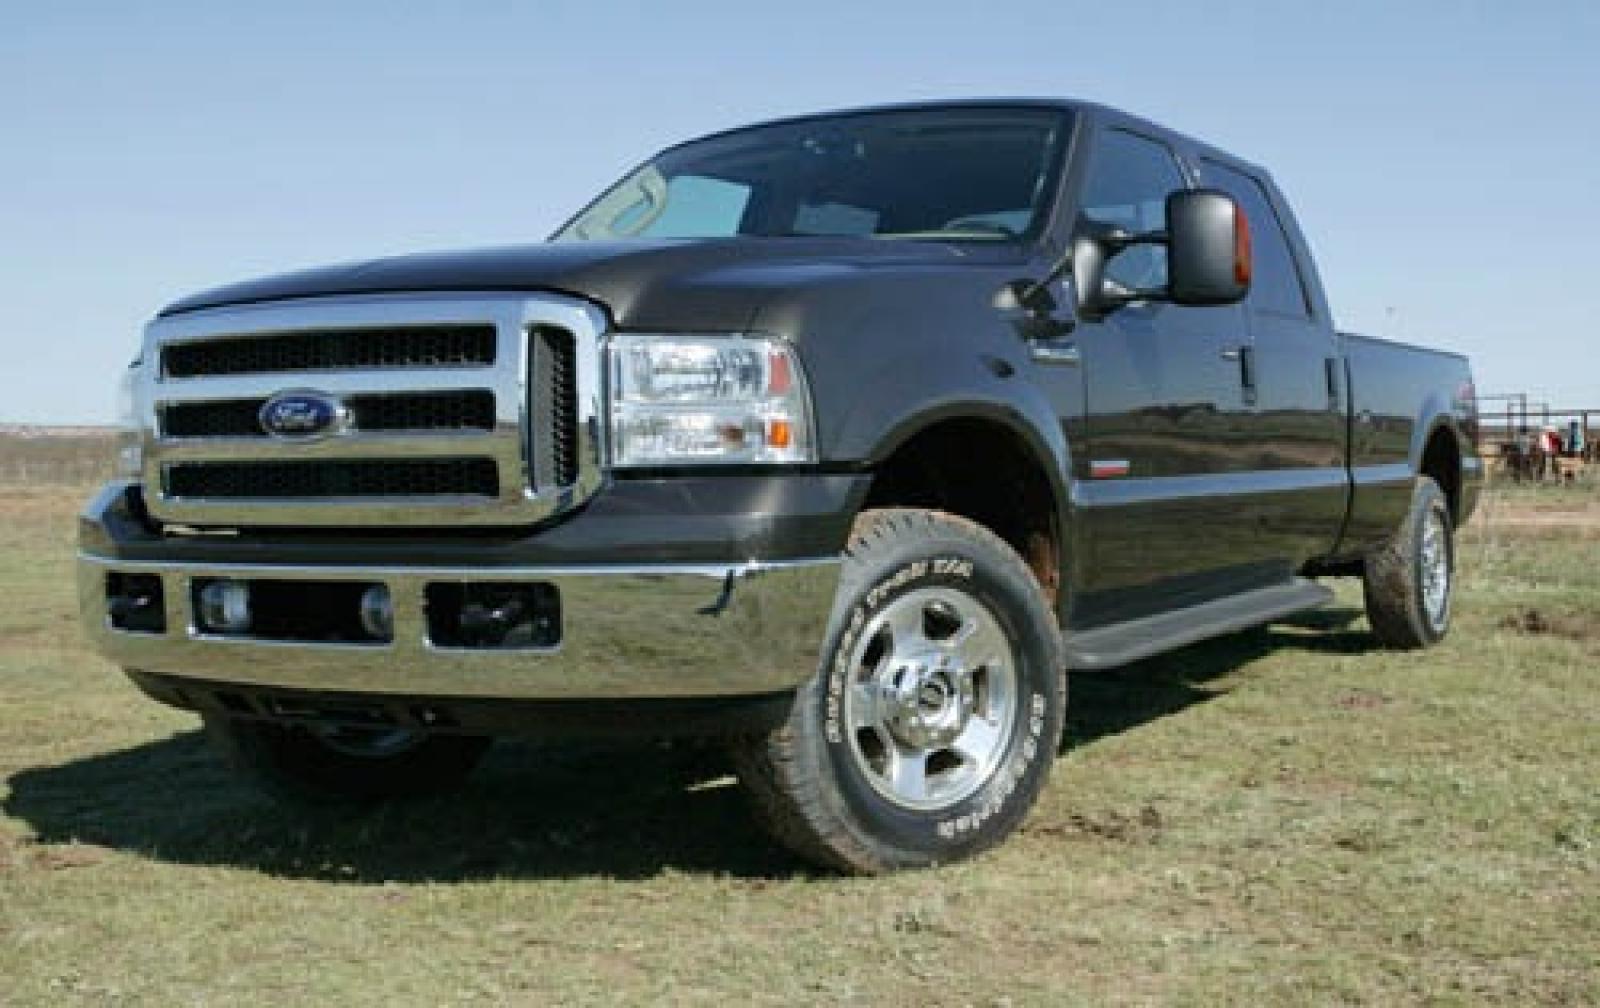 800 1024 1280 1600 origin 2006 ford f 350